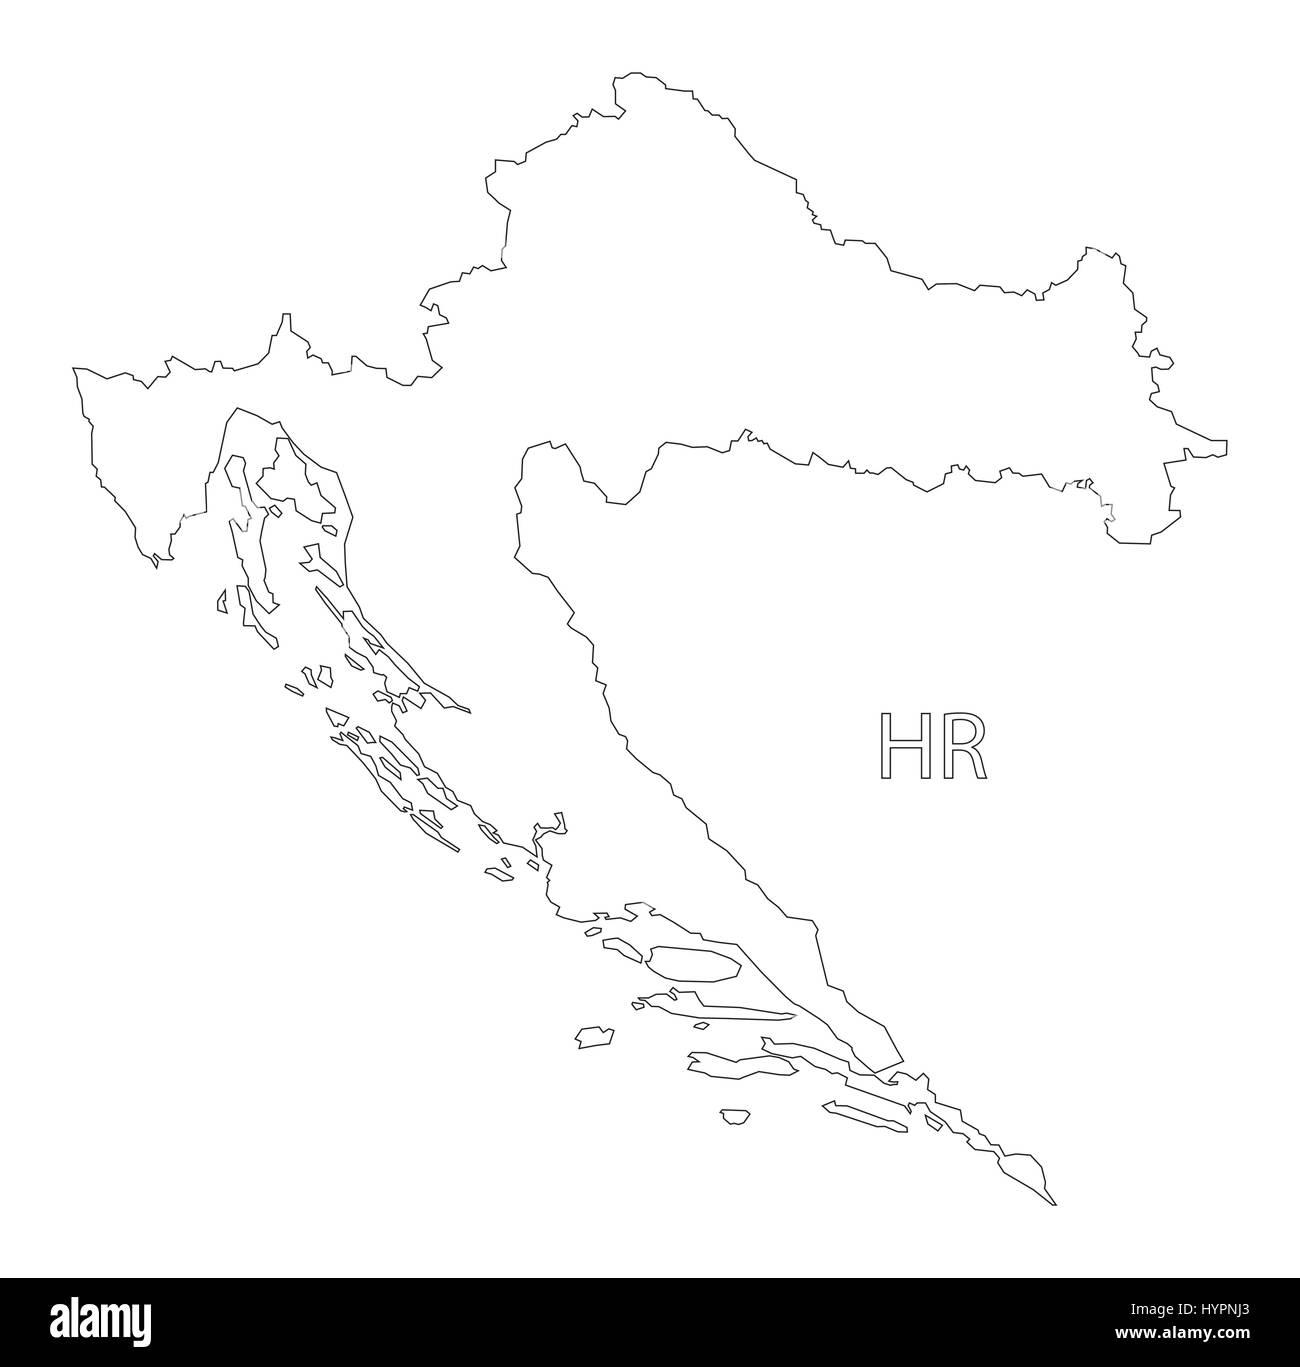 Croatia outline silhouette map illustration Stock Vector Art ...